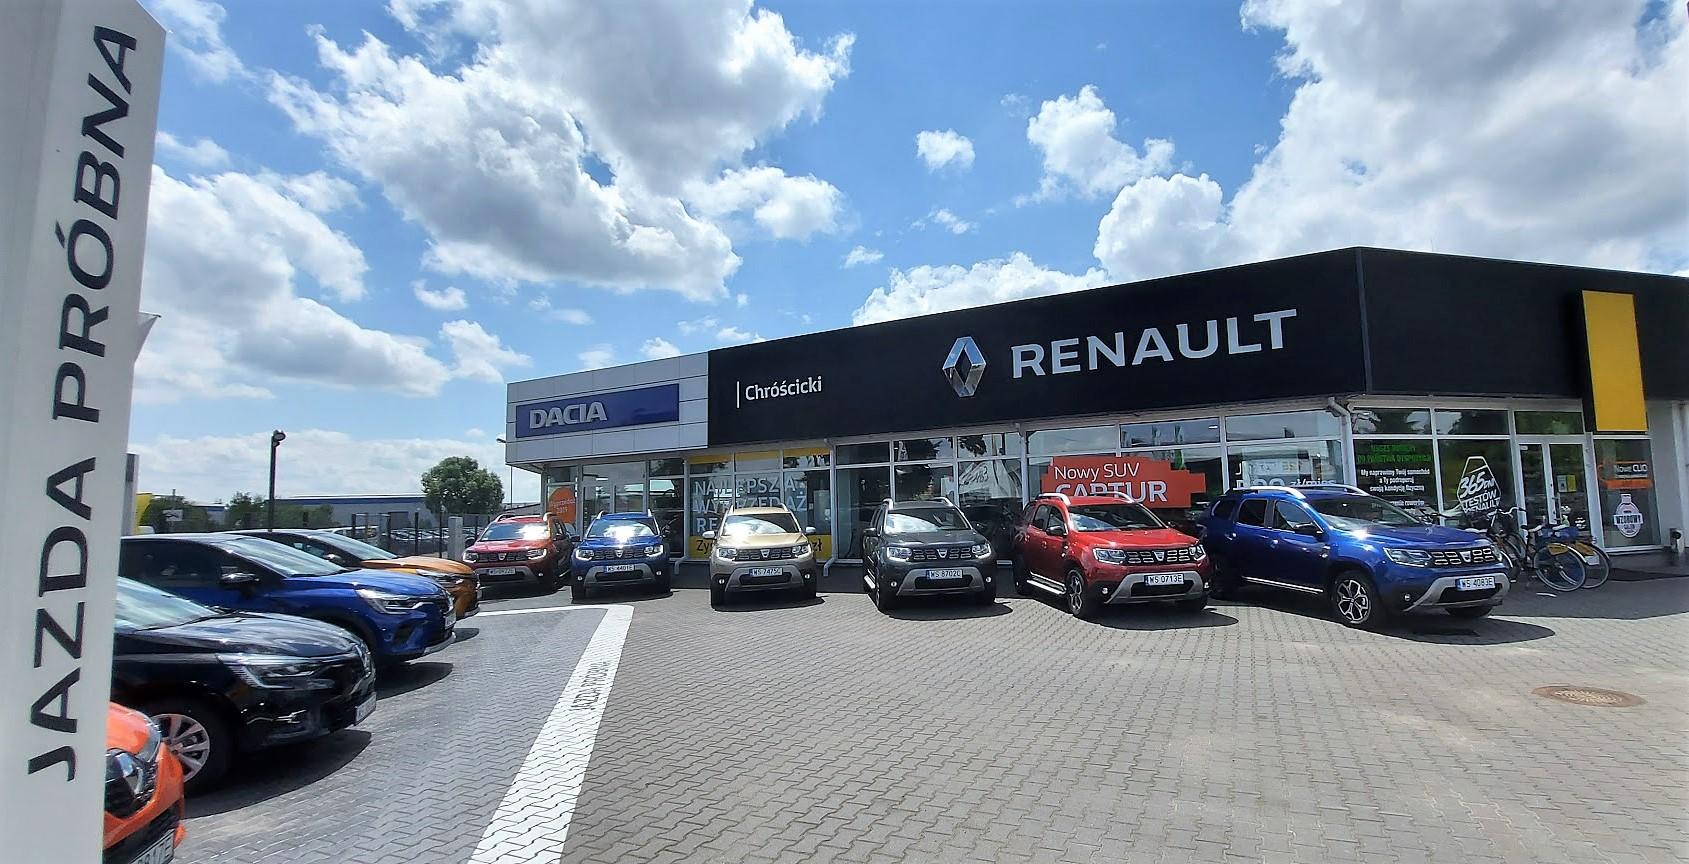 Renault AMS Chróścicki